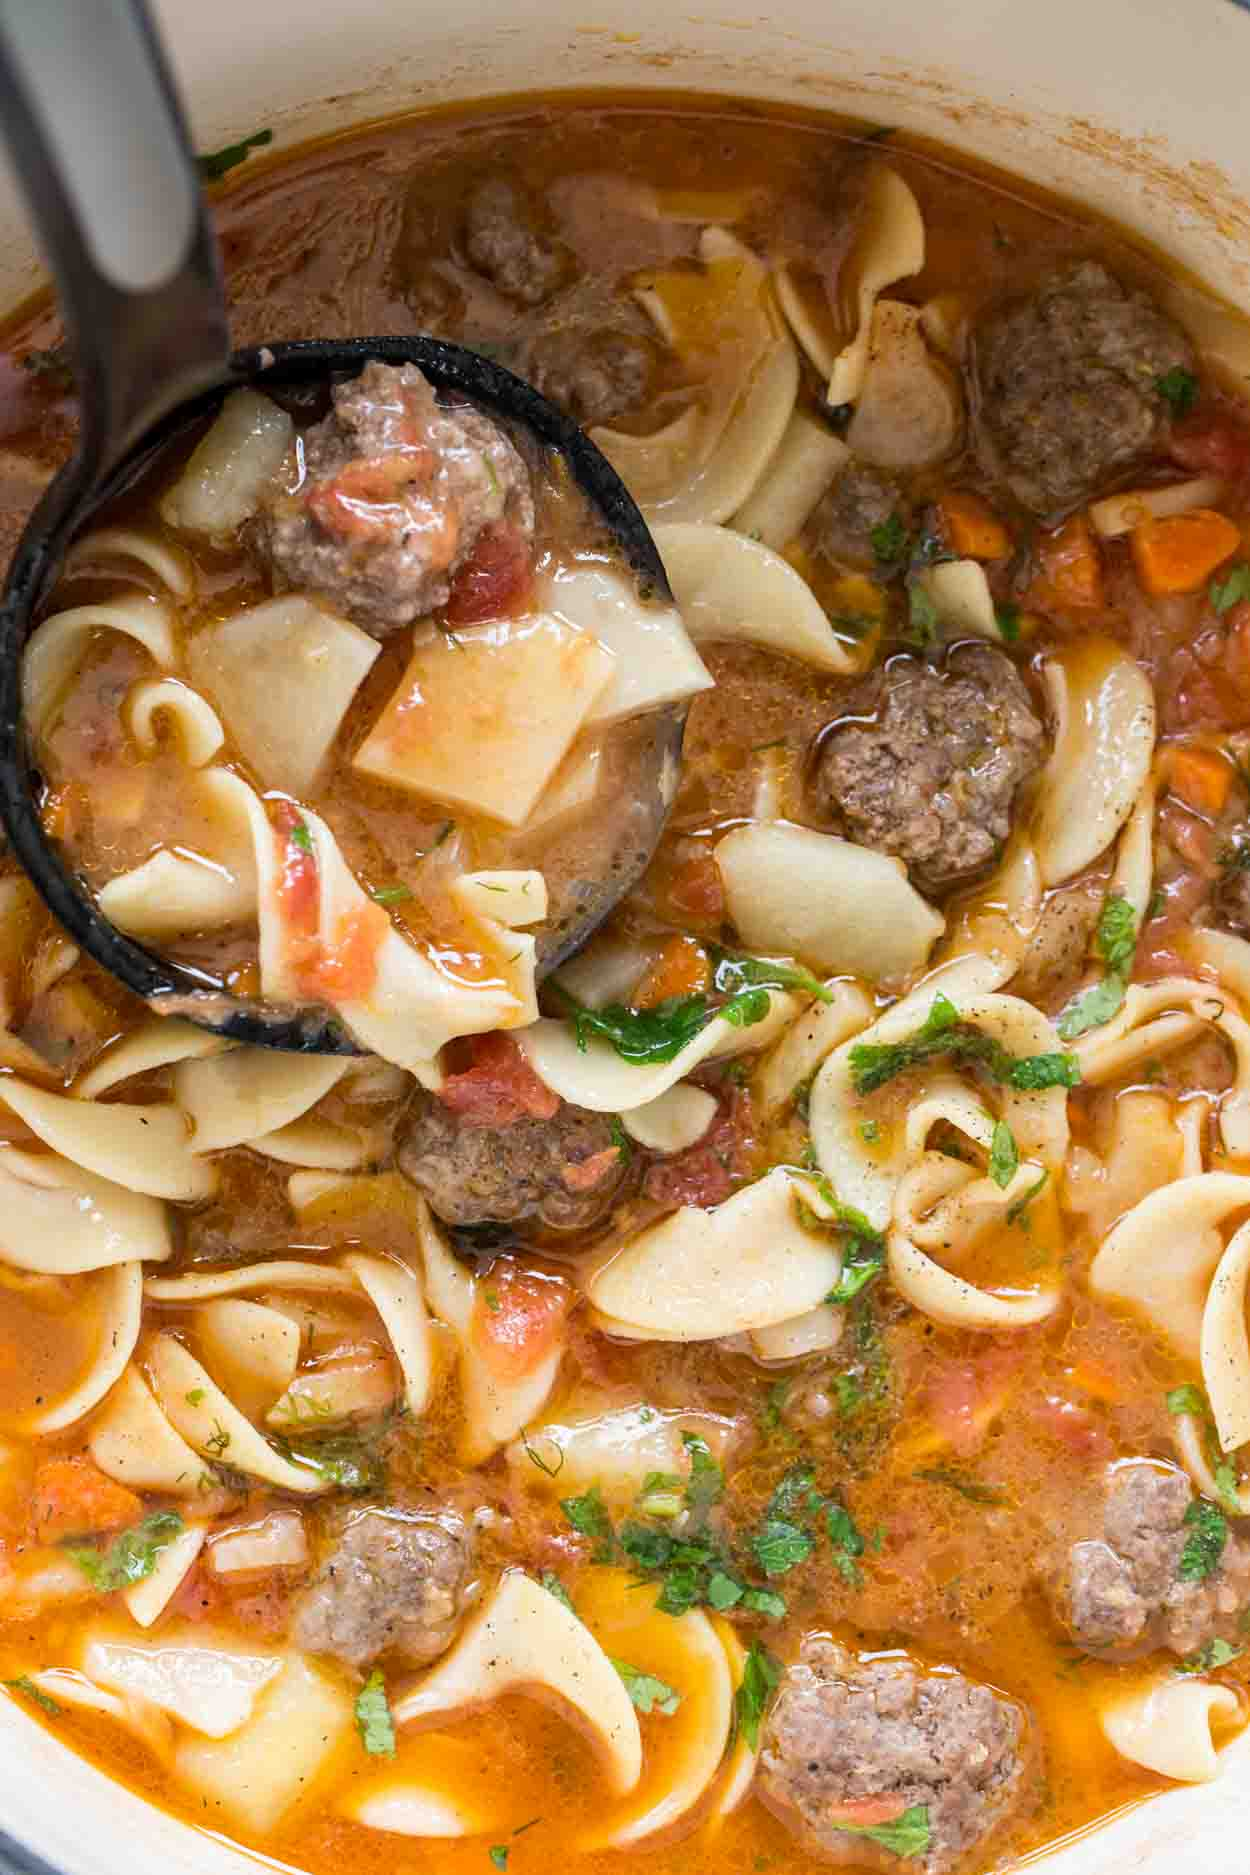 The Meatball Noodle Soup